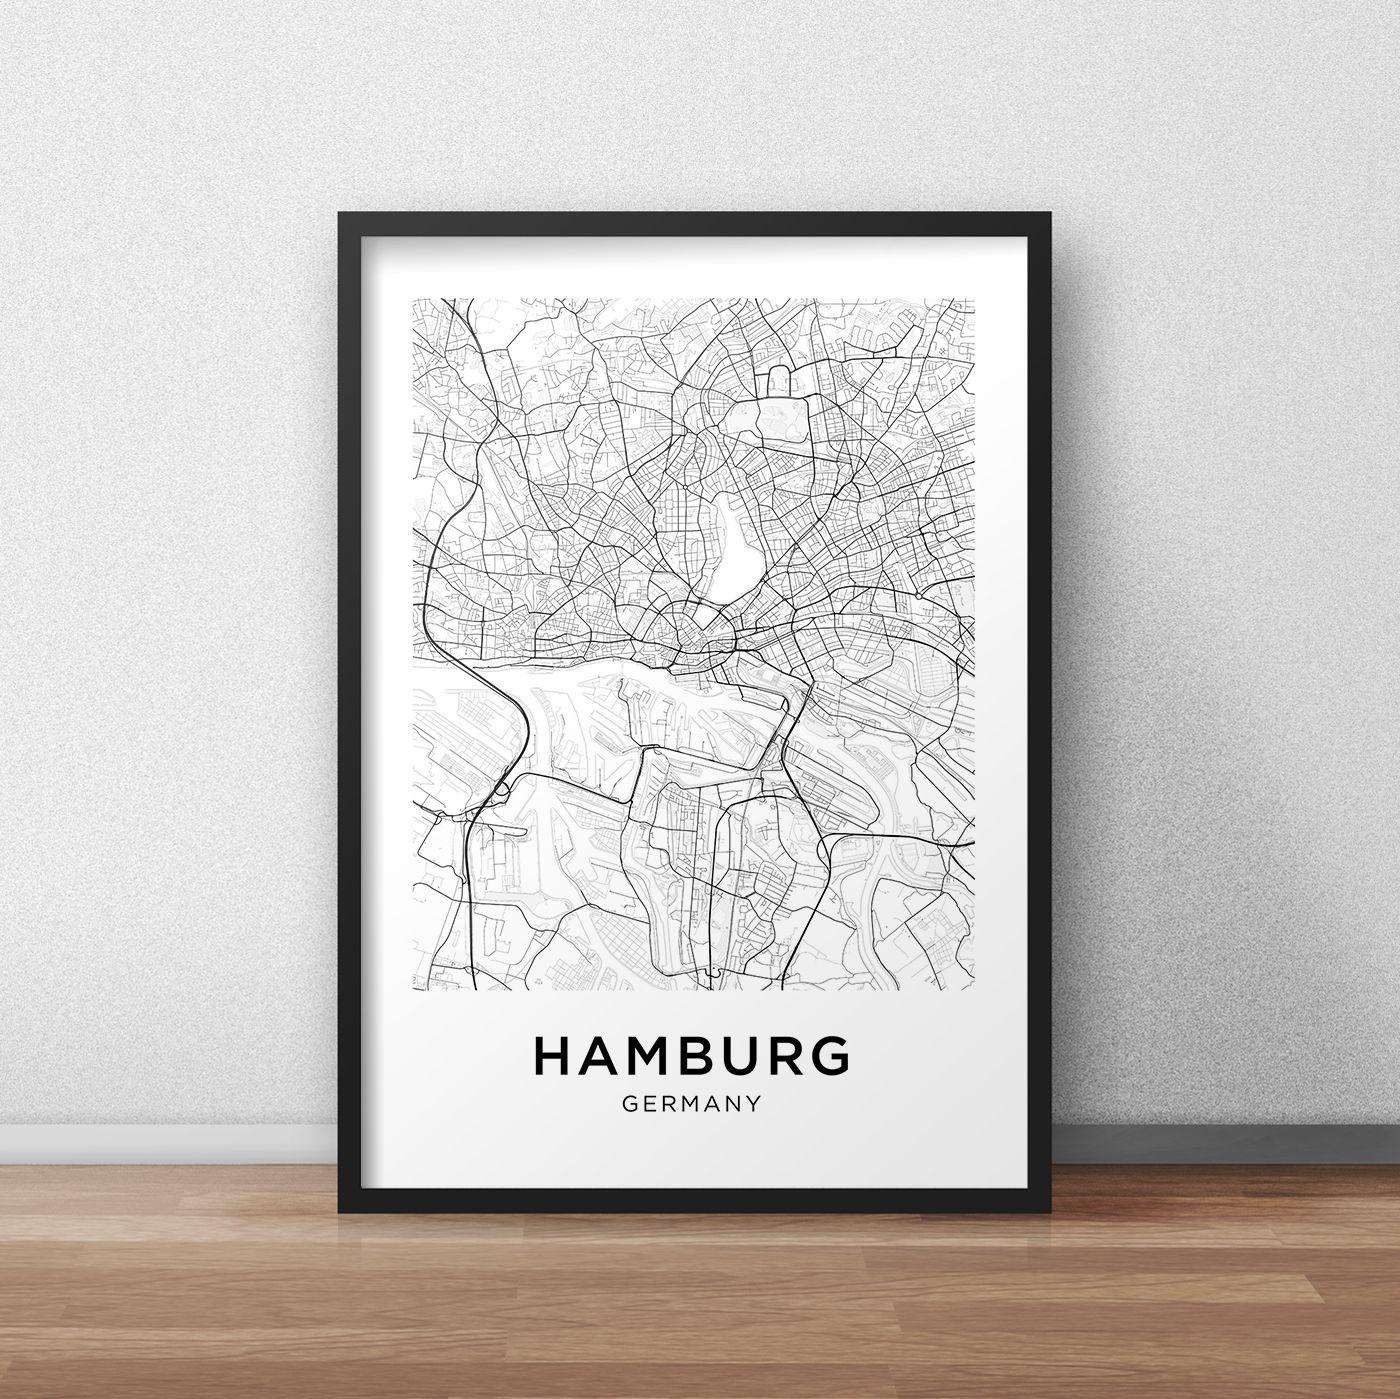 JYWDZSH Leinwanddruck Schwarz-Wei/ß-Wortplakat Stadtplan Hamburg Nordic Print Leinwand Malerei Wandbild f/ür Wohnkultur 15x20cm ohne Rahmen